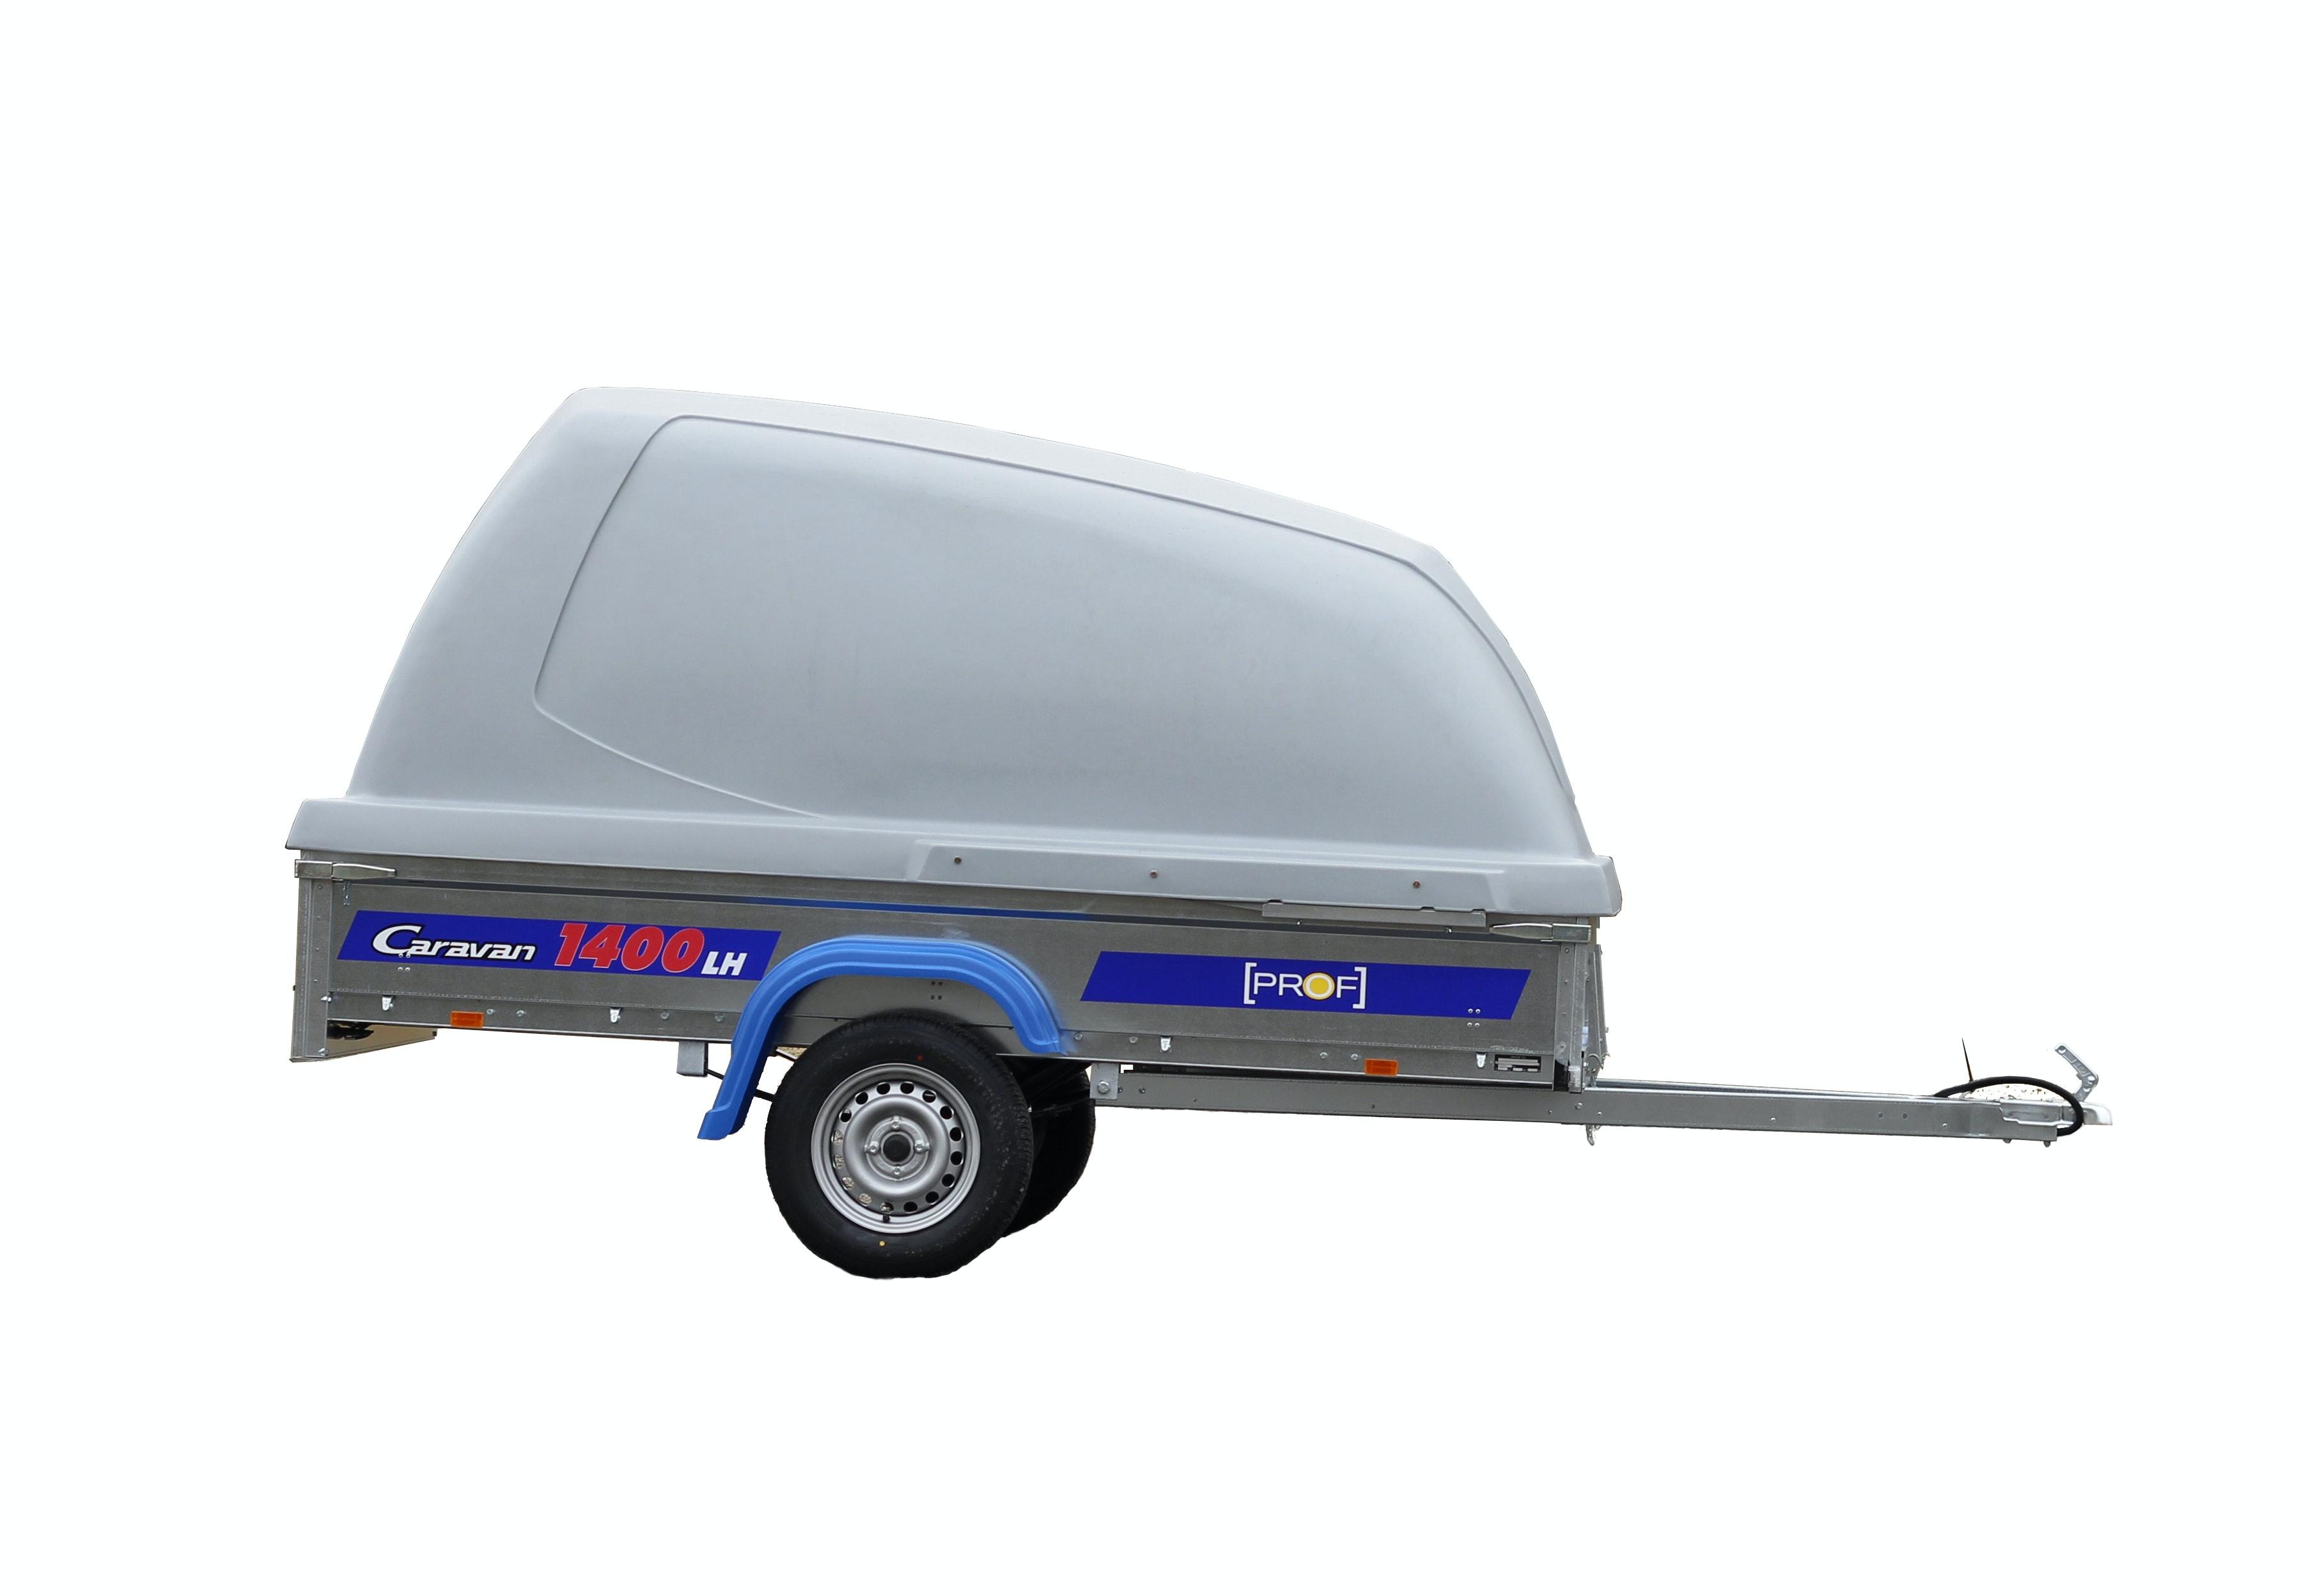 släpvagn med kåpa pris